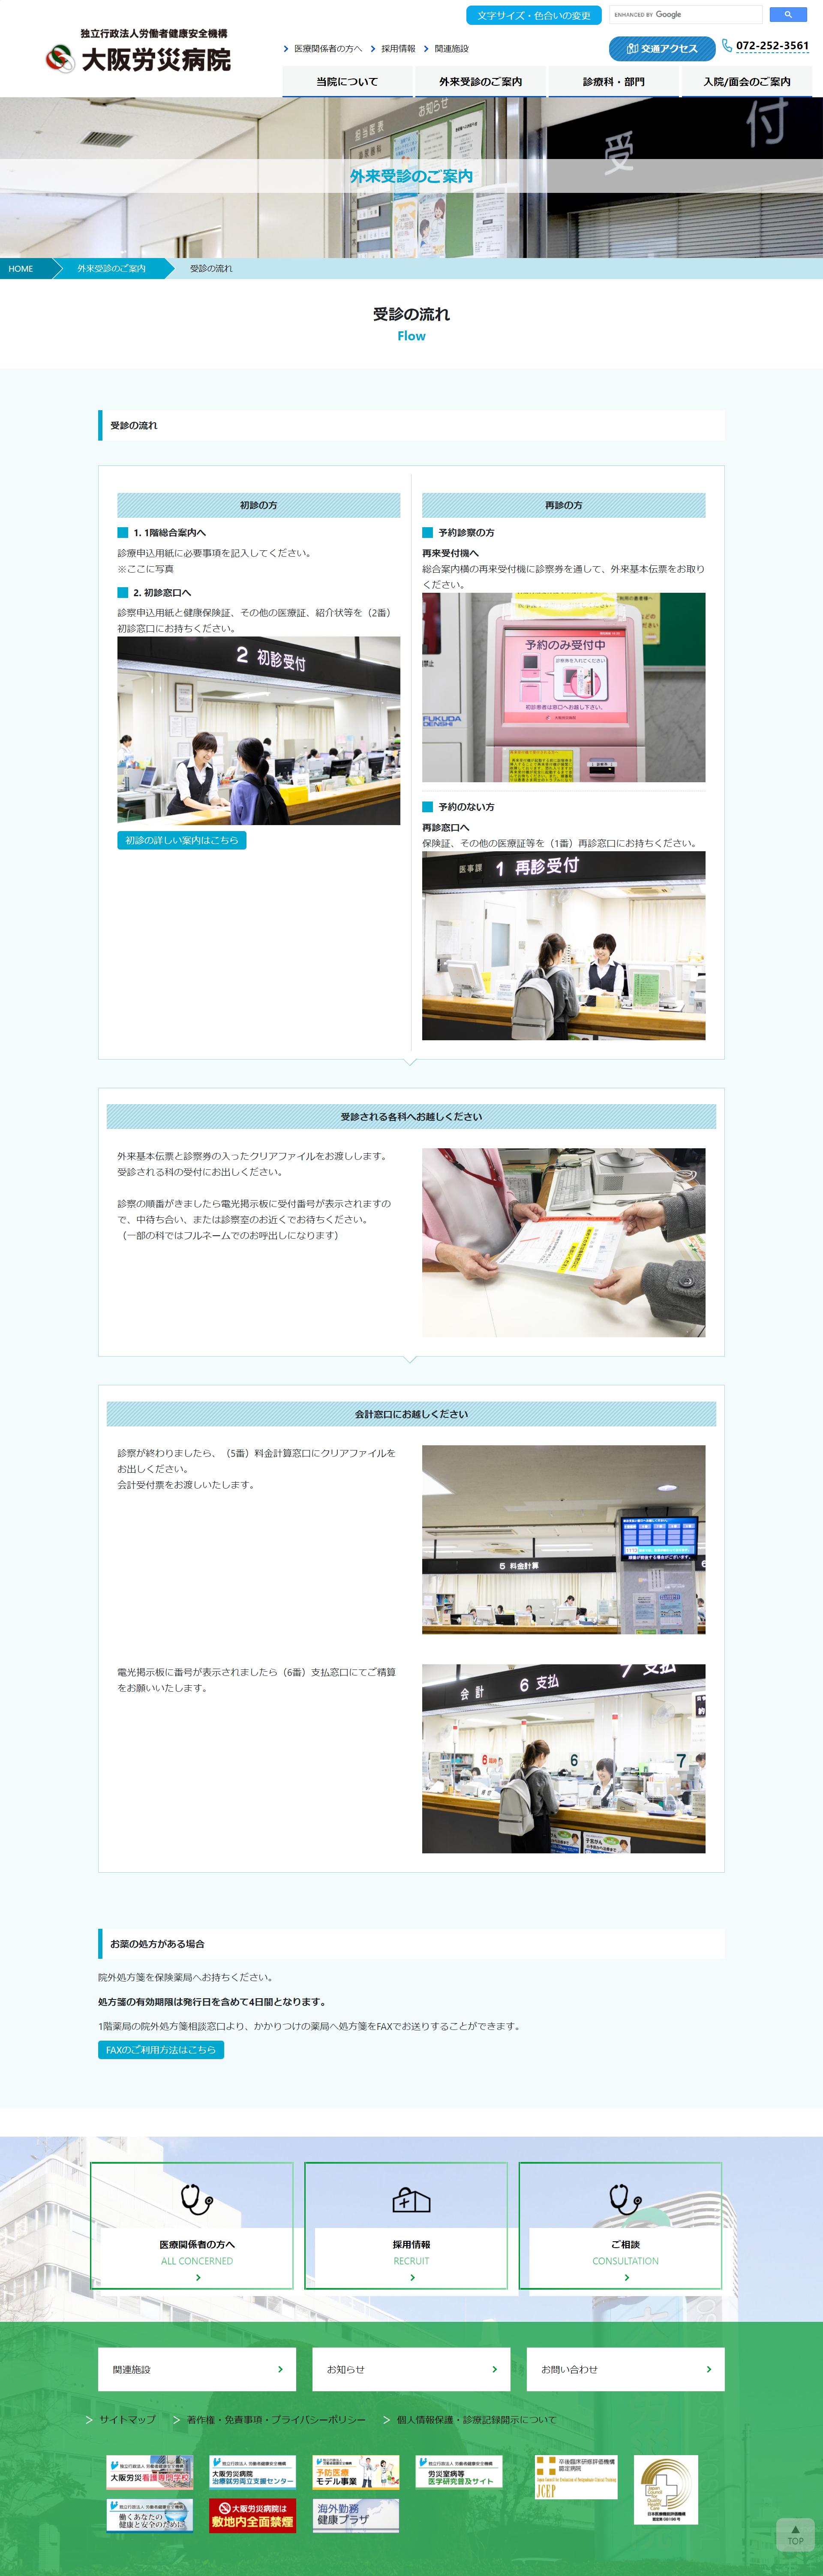 2020年2月作成「大阪労災病院」病院サイト_サブ画像